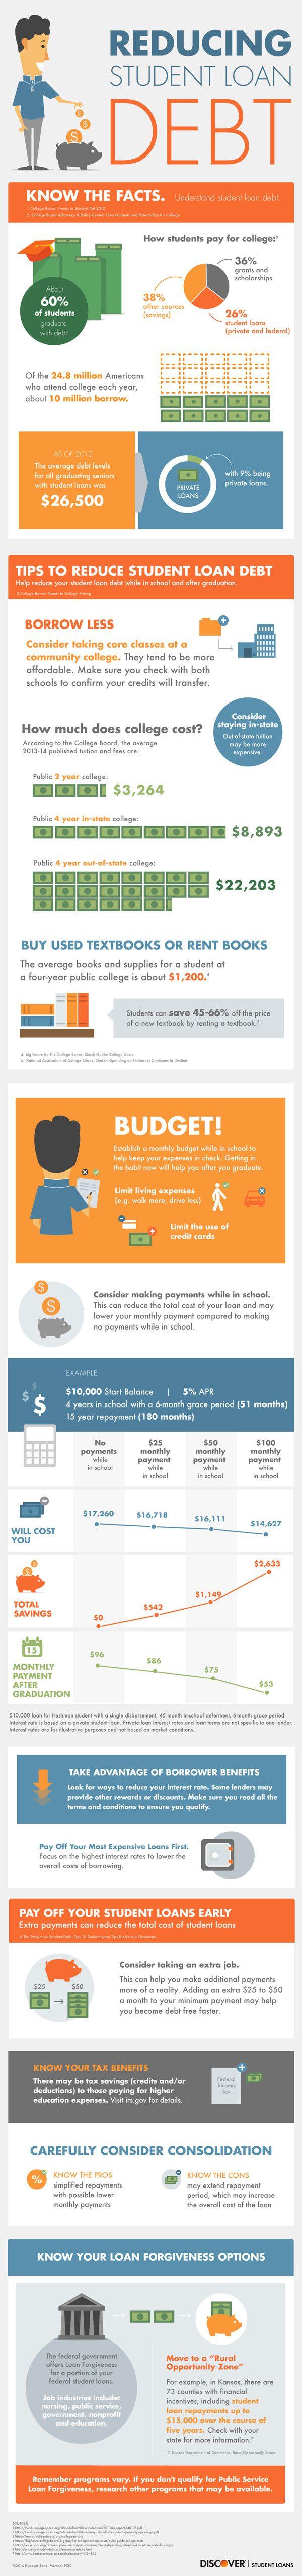 Should Student Loan Debt Be Forgiven?